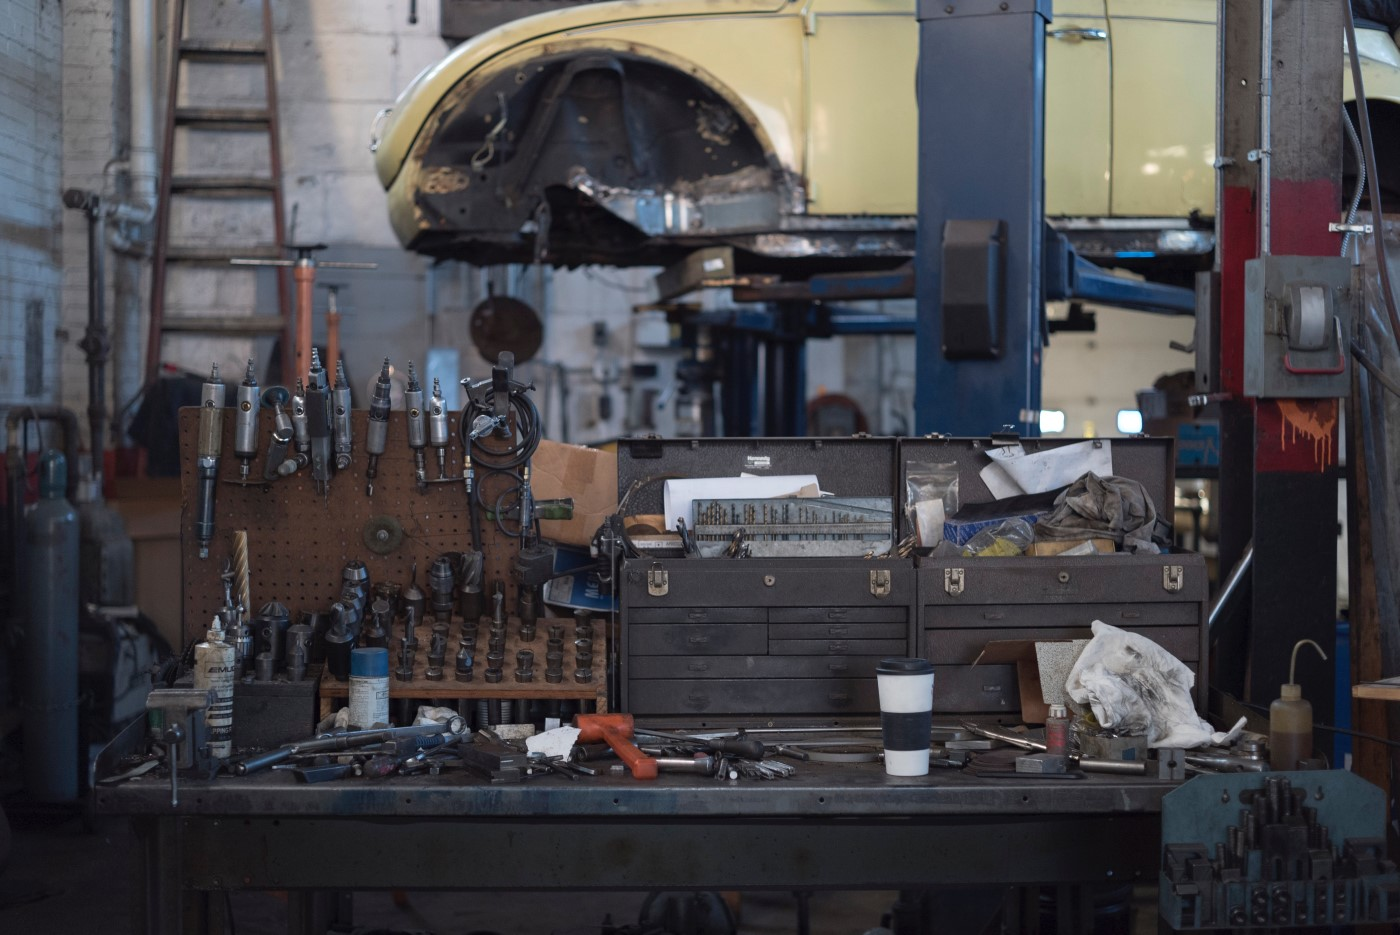 Inside the scrap car business